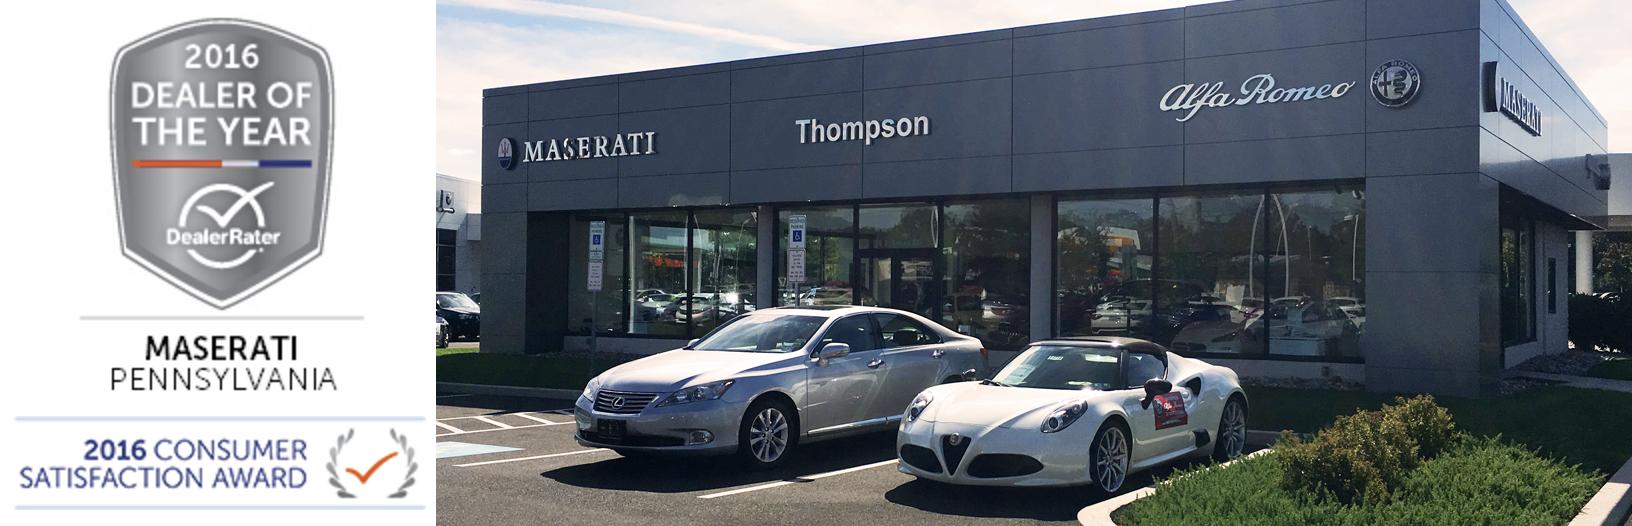 Maserati Wayne Maserati Dealer Near Wayne PA - Maserati car dealership